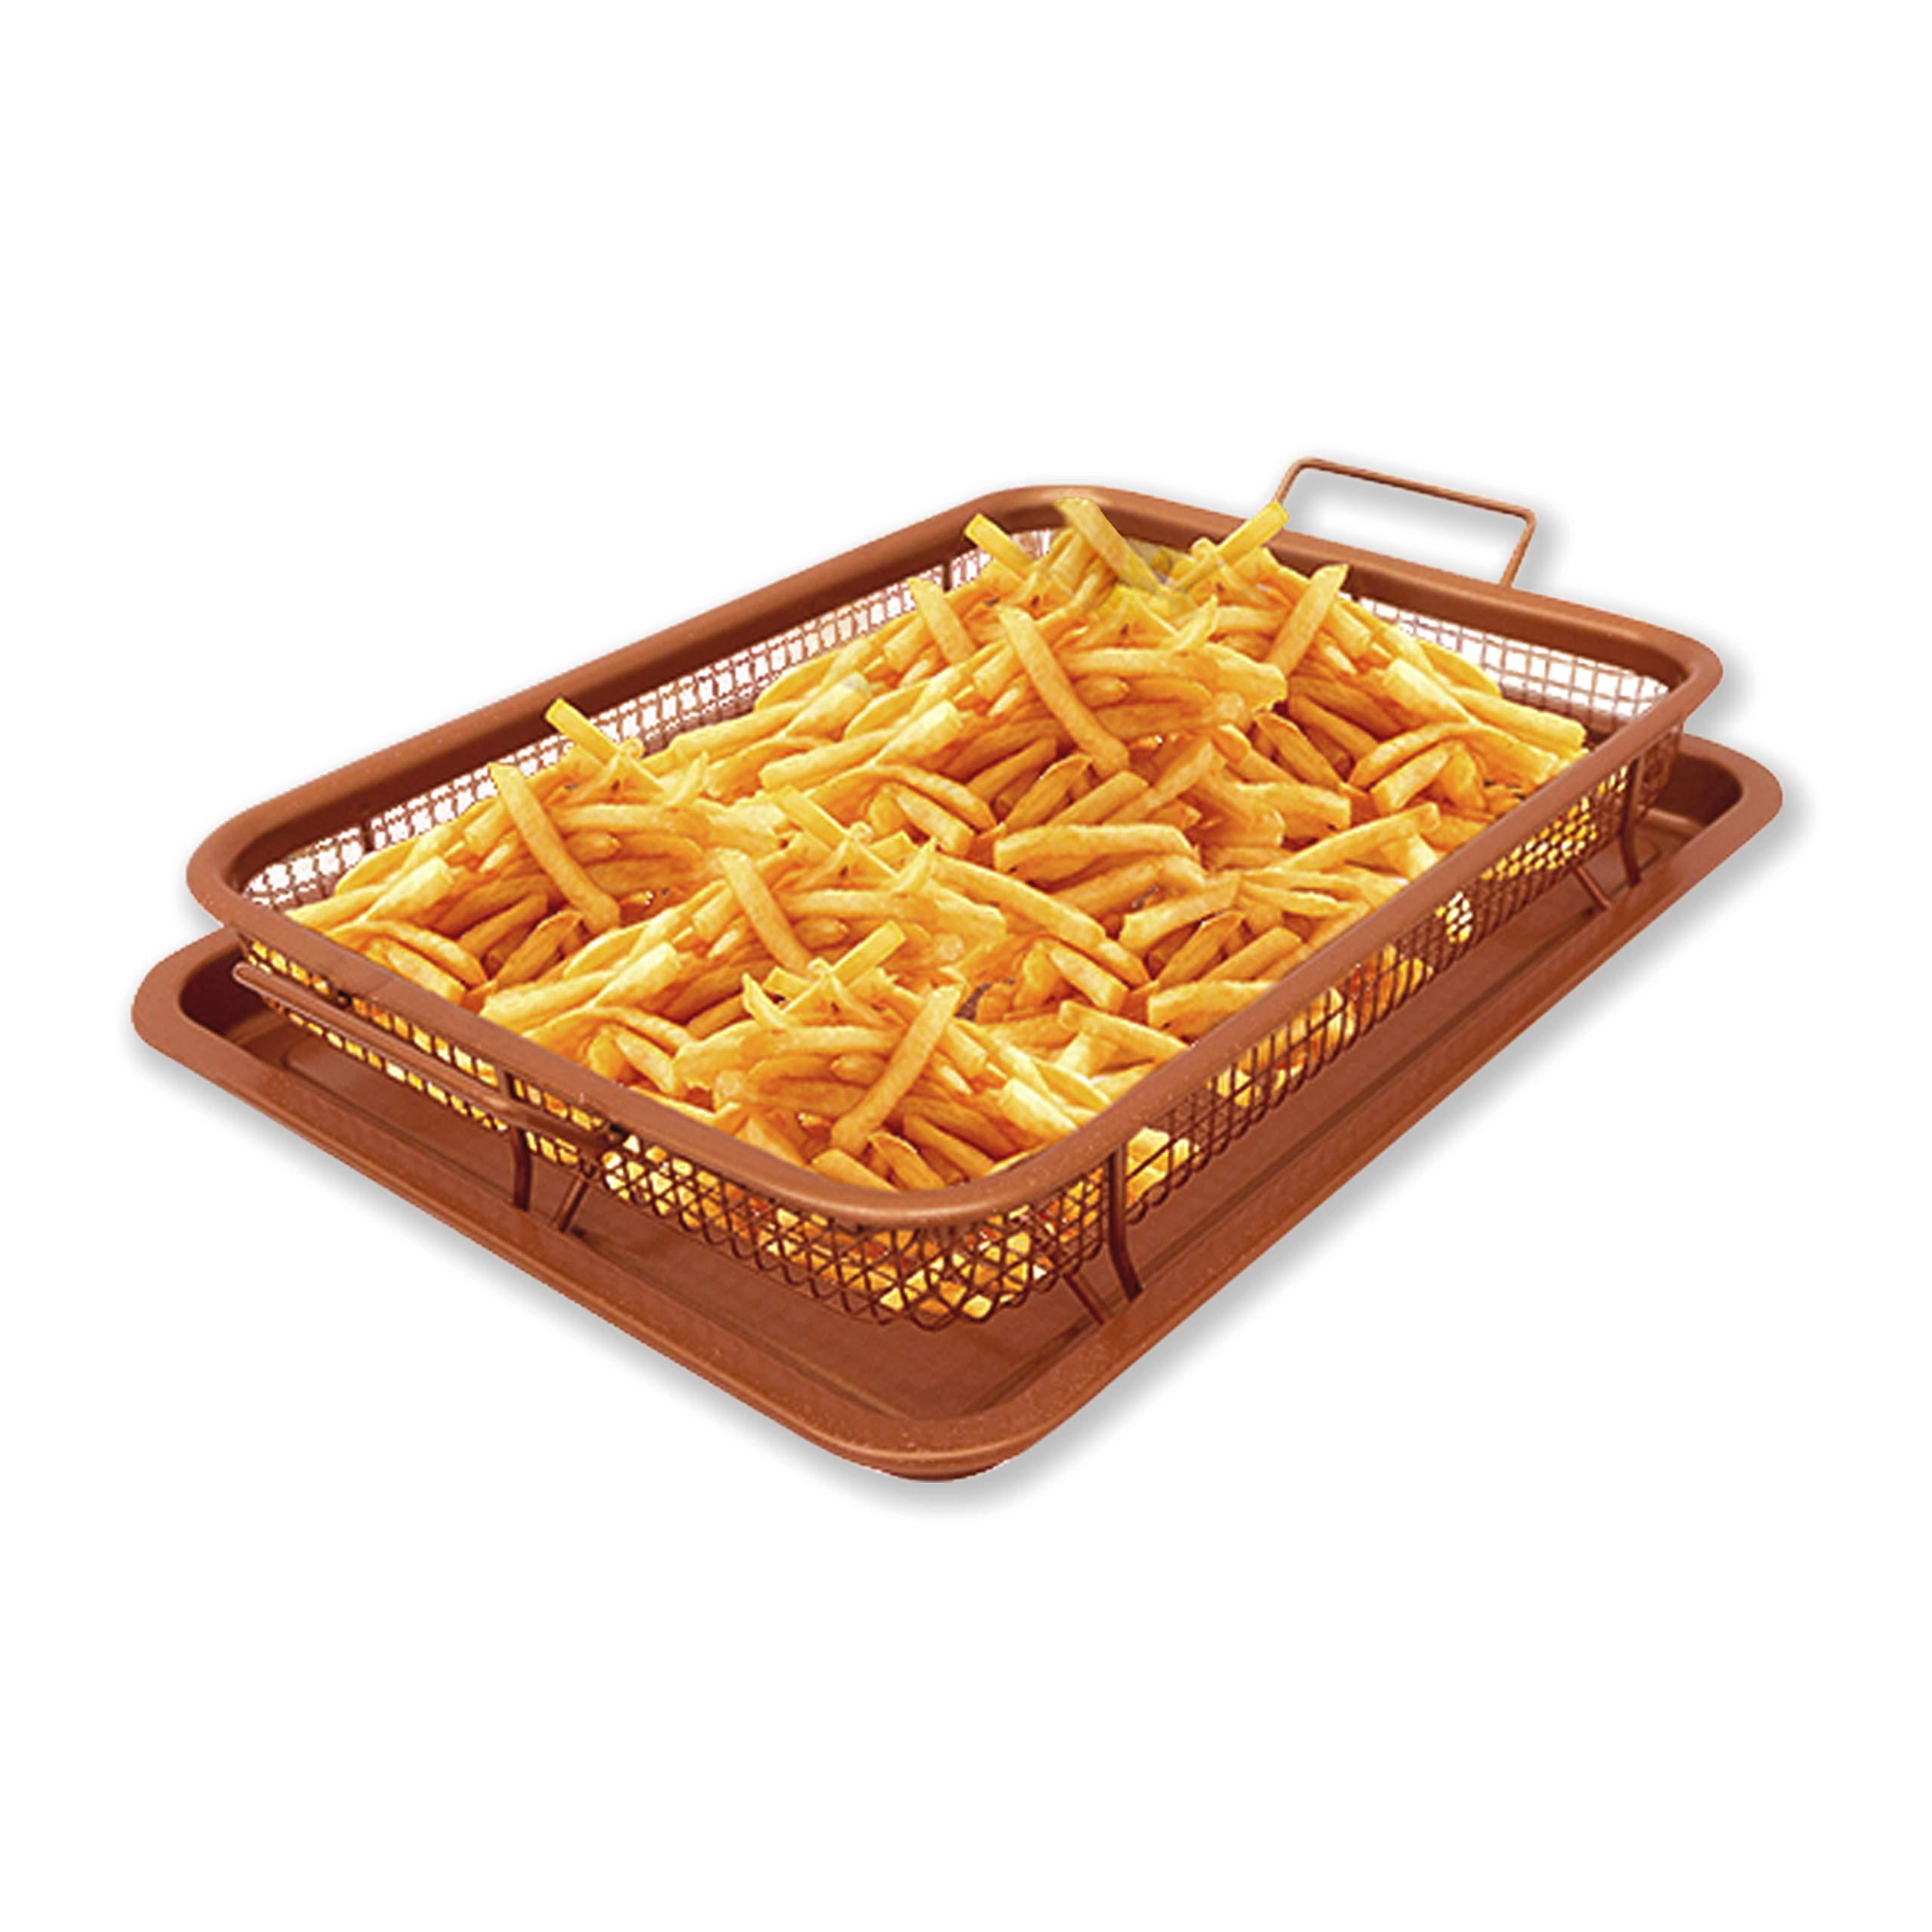 Copper Crisper Oven Air Fryer – Non Stick Crisper Tray Copper Basket Air Fryer